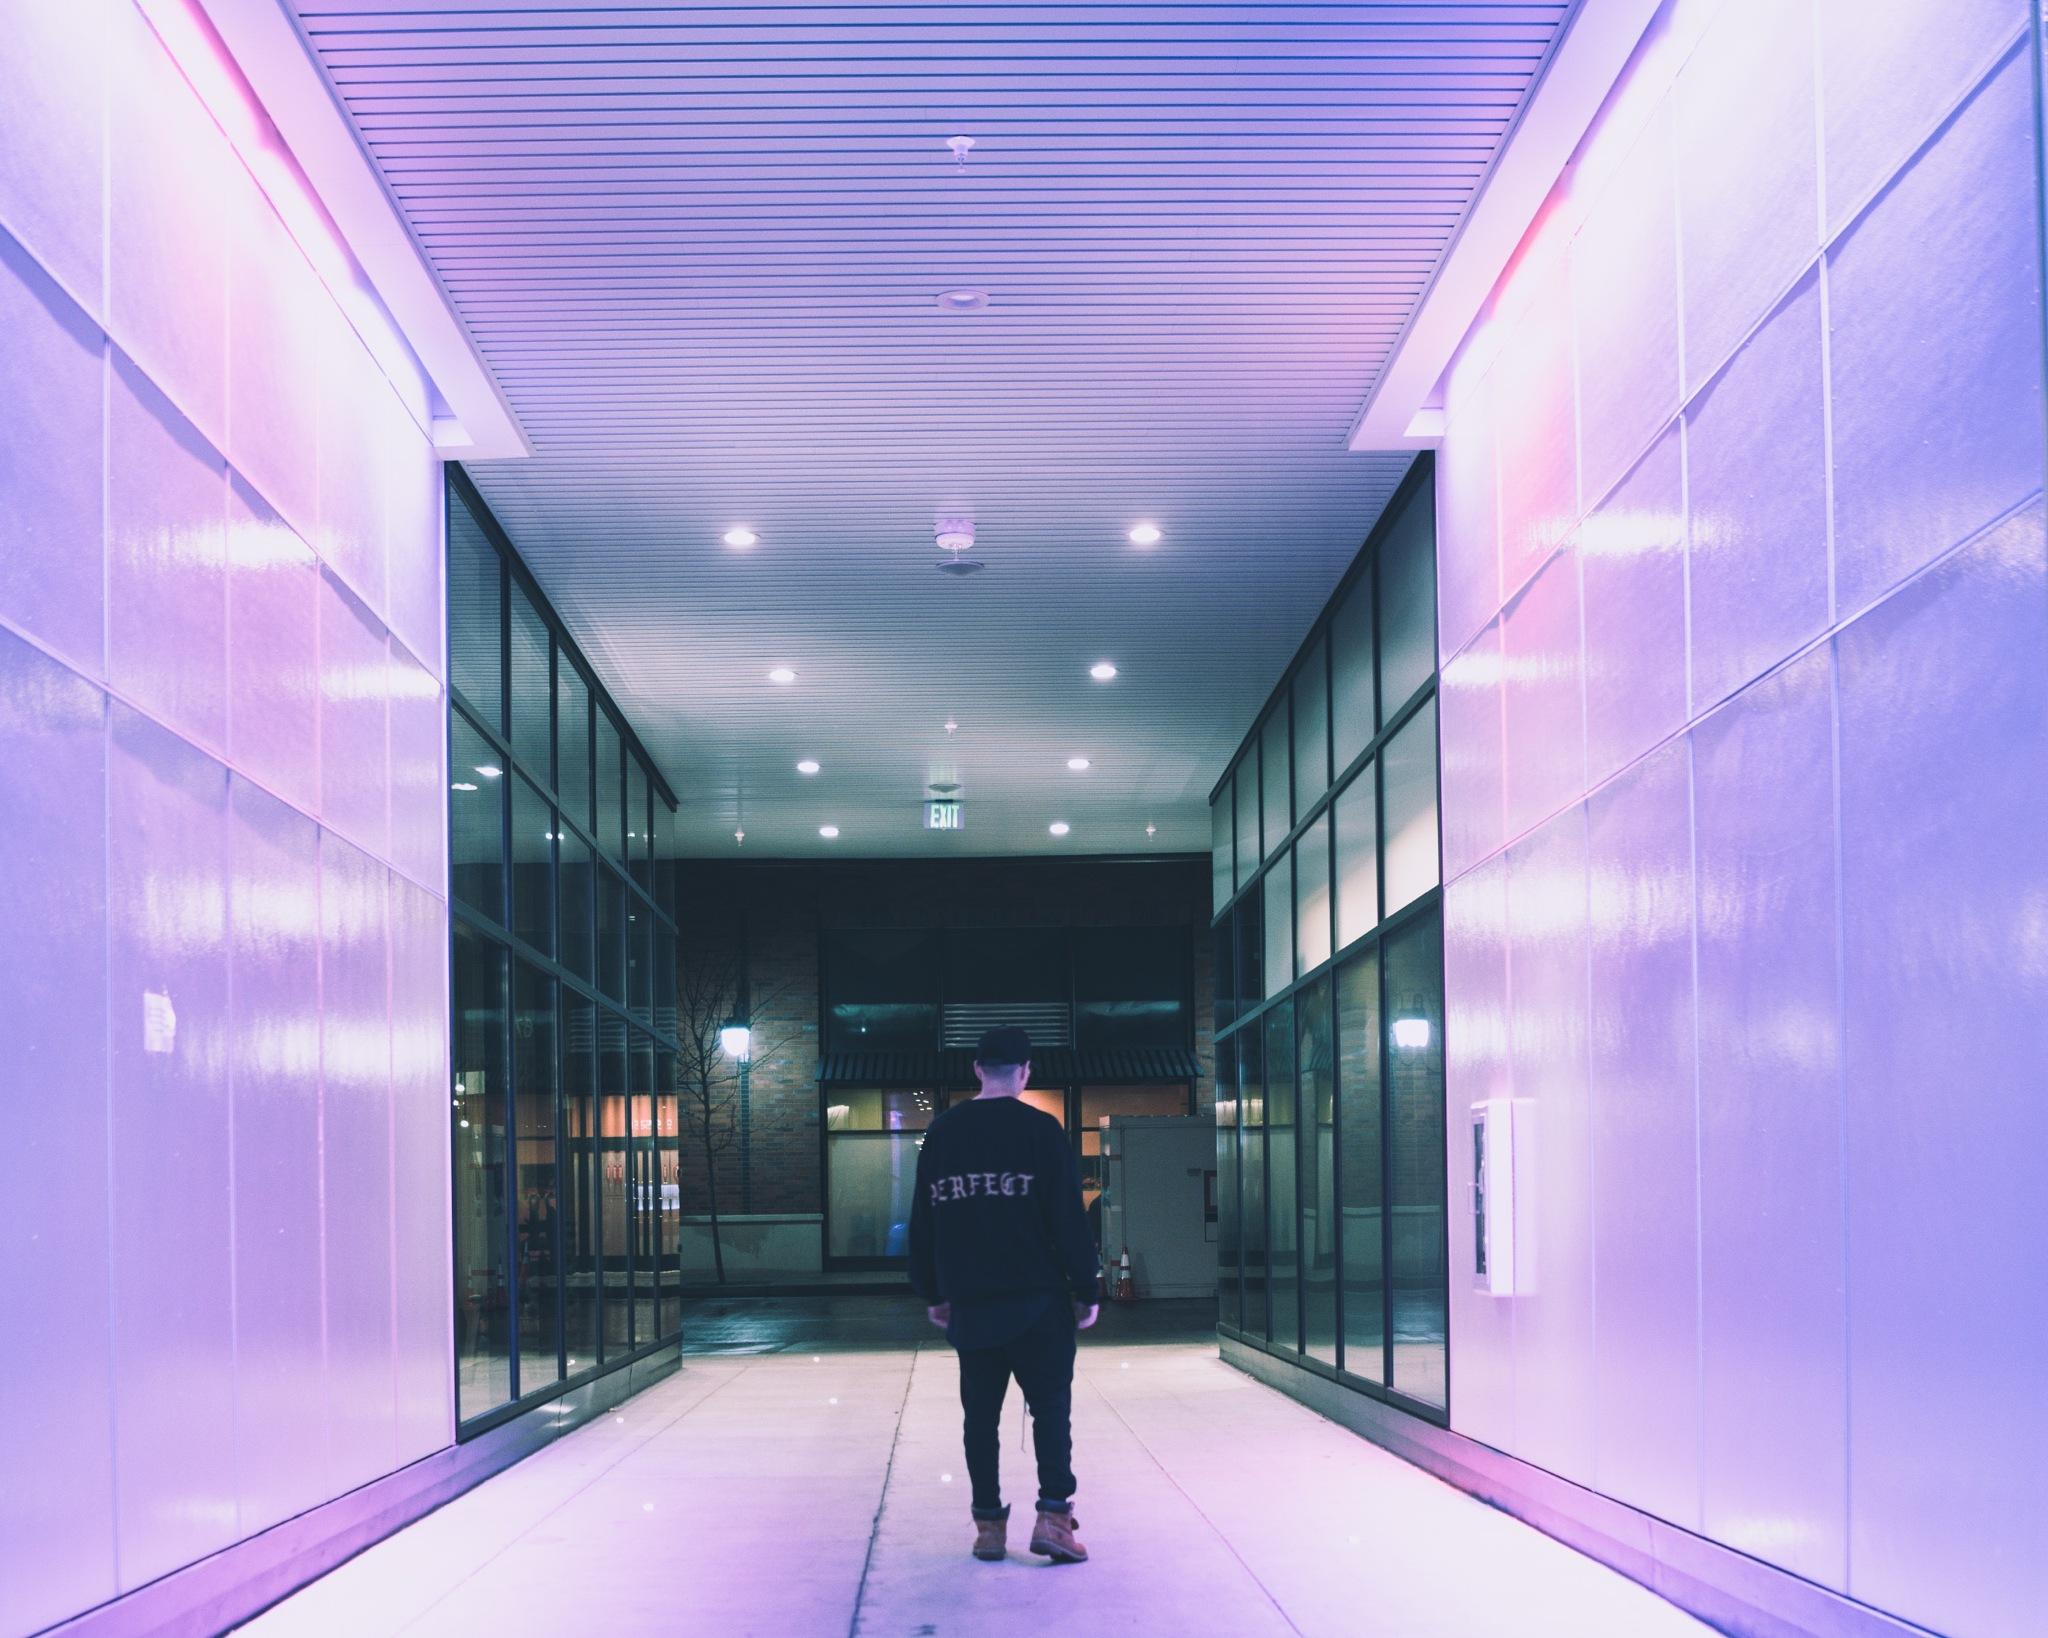 Purple lit hallway by Jon Sithiphong